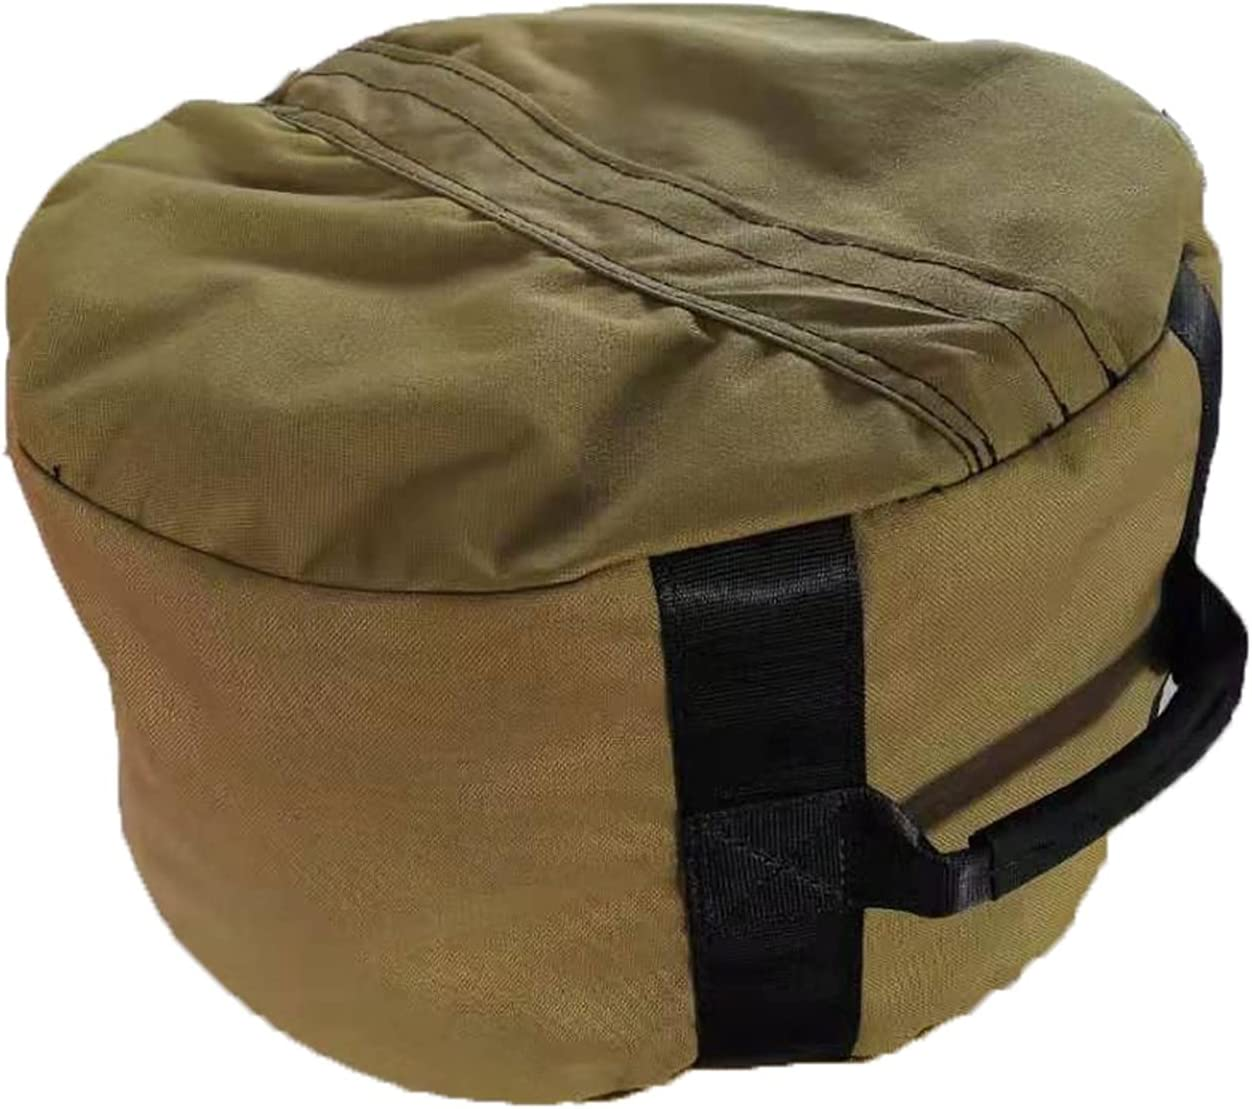 FFOO Free shipping on posting reviews Boxing Bag Punching Bags Handle Heavy Sandbags Strongman Du Max 44% OFF